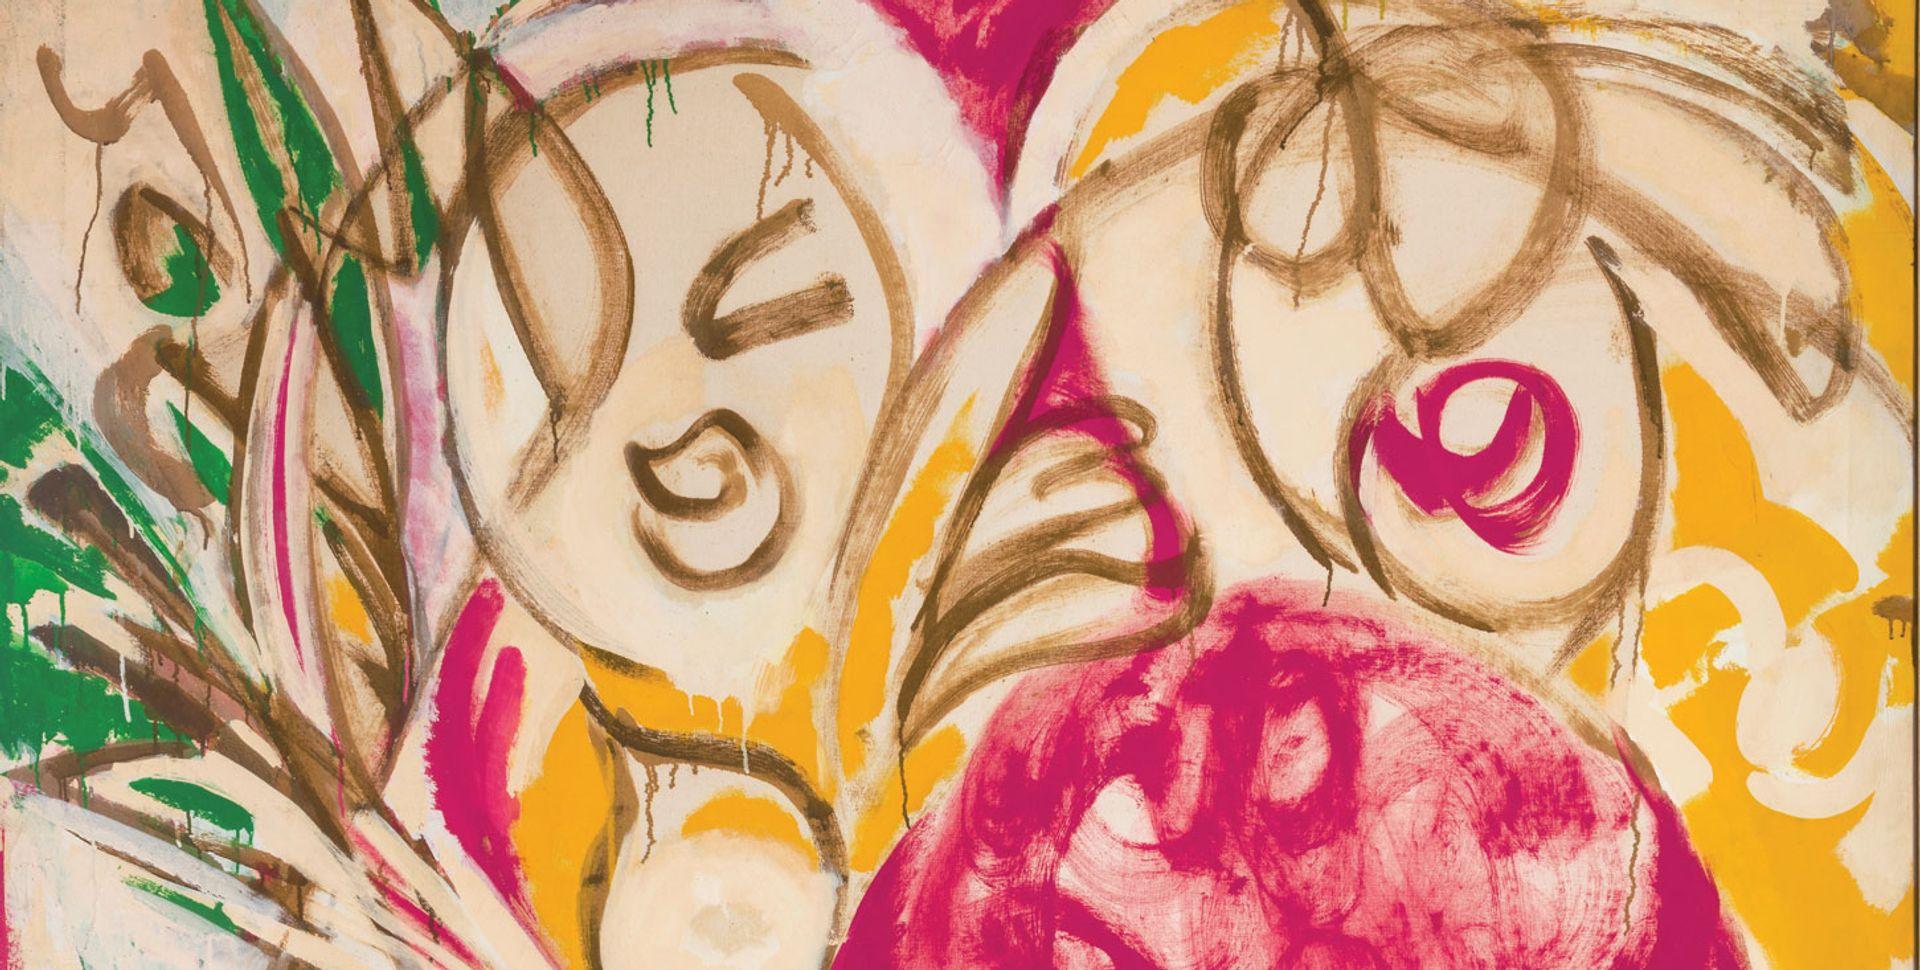 Detail of Lee Krasner's Sunwoman, I (1957) (Courtesy Kasmin Gallery. Photo: Diego Flores. © 2020 Pollock-Krasner Foundation, ARS) Detail of Lee Krasner's Sunwoman, I (1957) (Courtesy Kasmin Gallery. Photo: Diego Flores. © 2020 Pollock-Krasner Foundation, ARS)